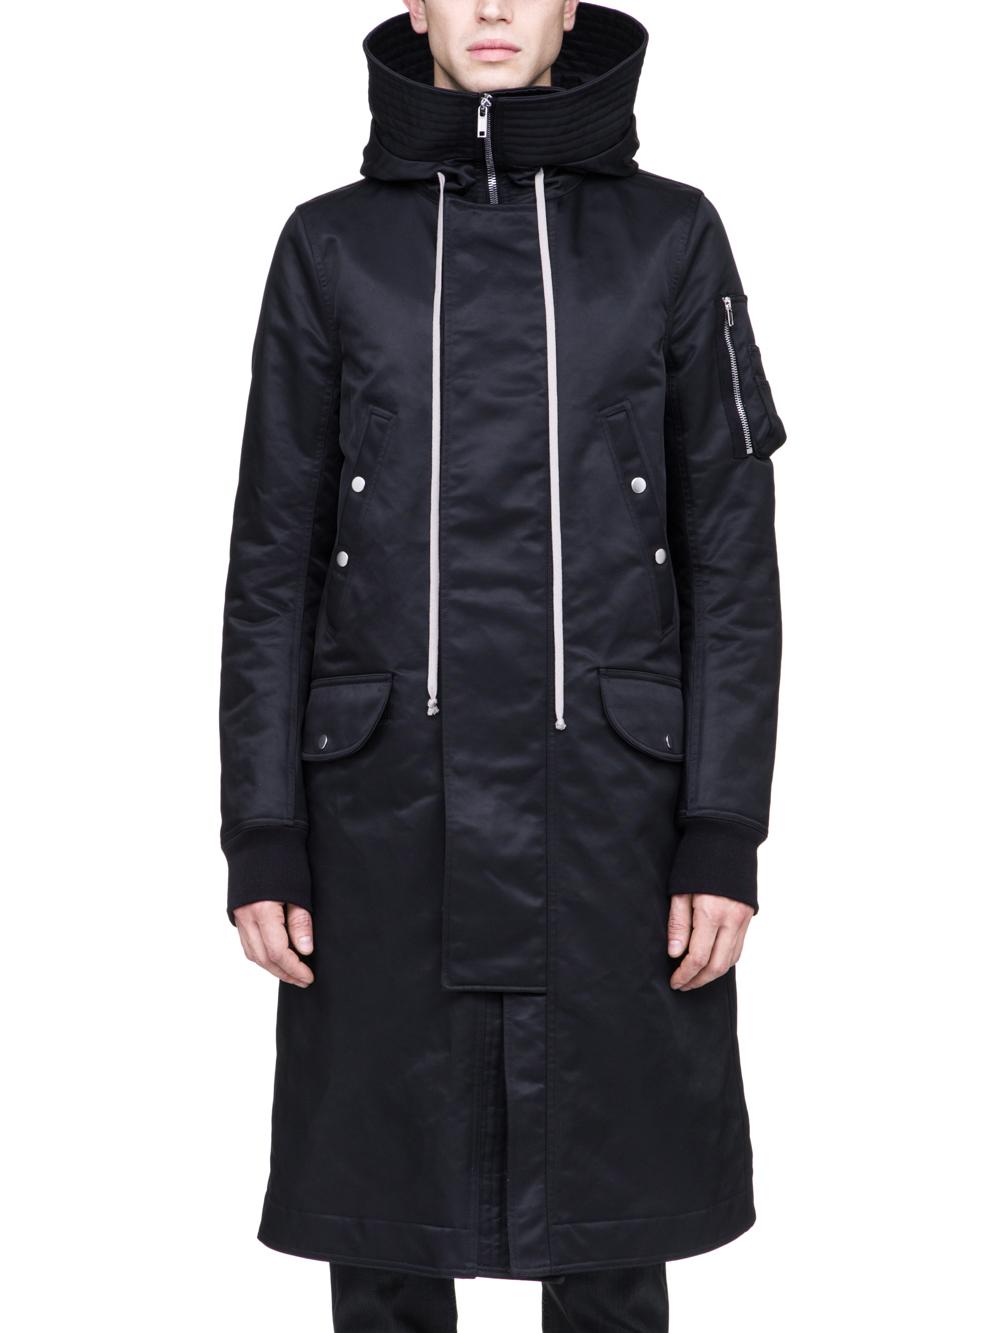 drkshdw jackets rick owens